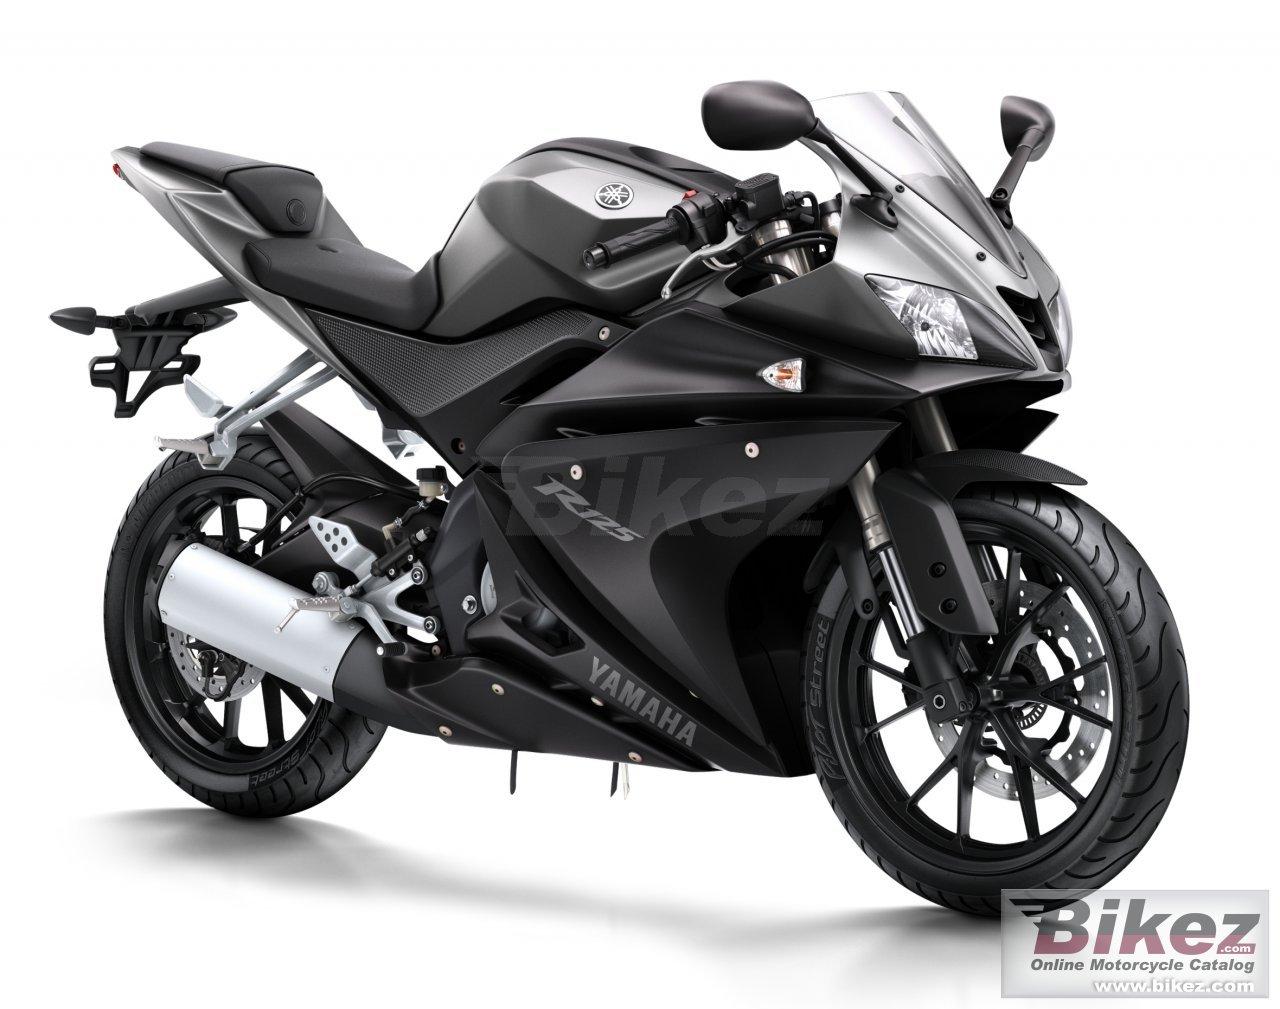 Motocikli Oprema I Delovi Nalepnice Za Motore Yamaha Yzf R125